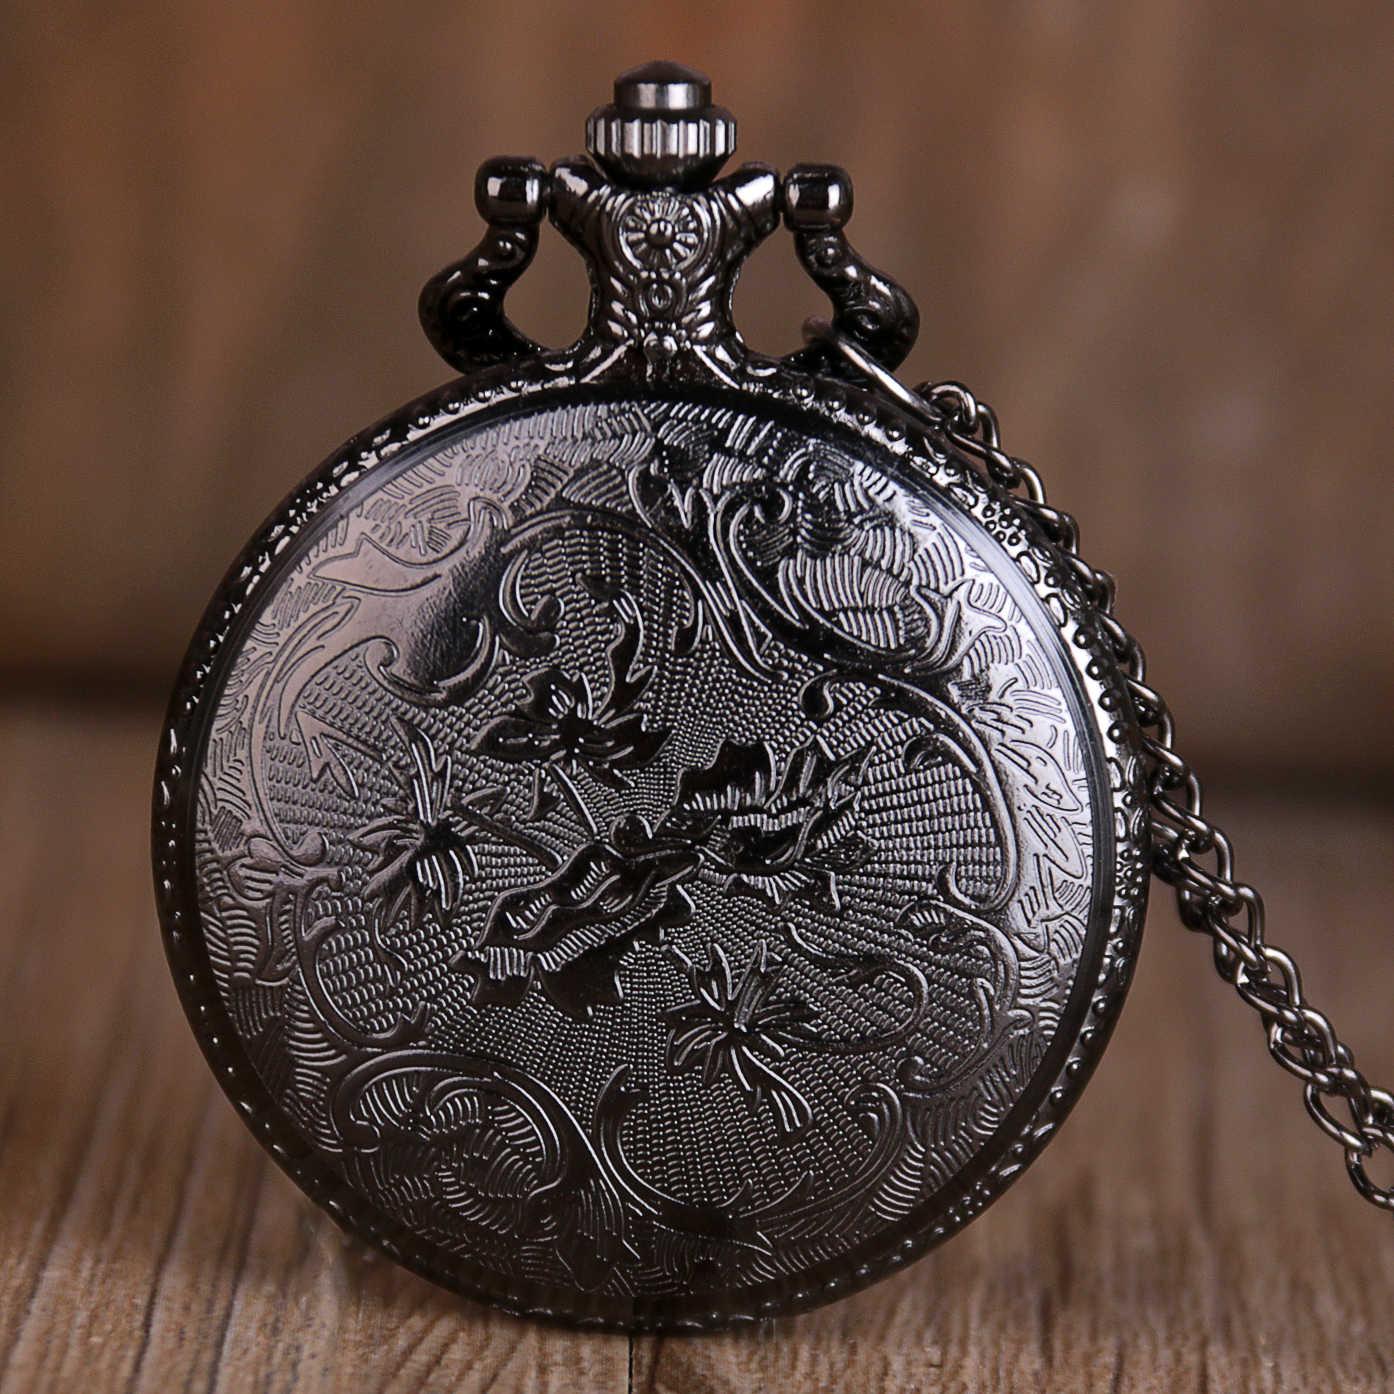 Creative Rereo רוח רעה ארוך לשון קוורץ שעון כיס עם שרשרת שרשרת נשים מתנת שעון Mens פוב שעונים